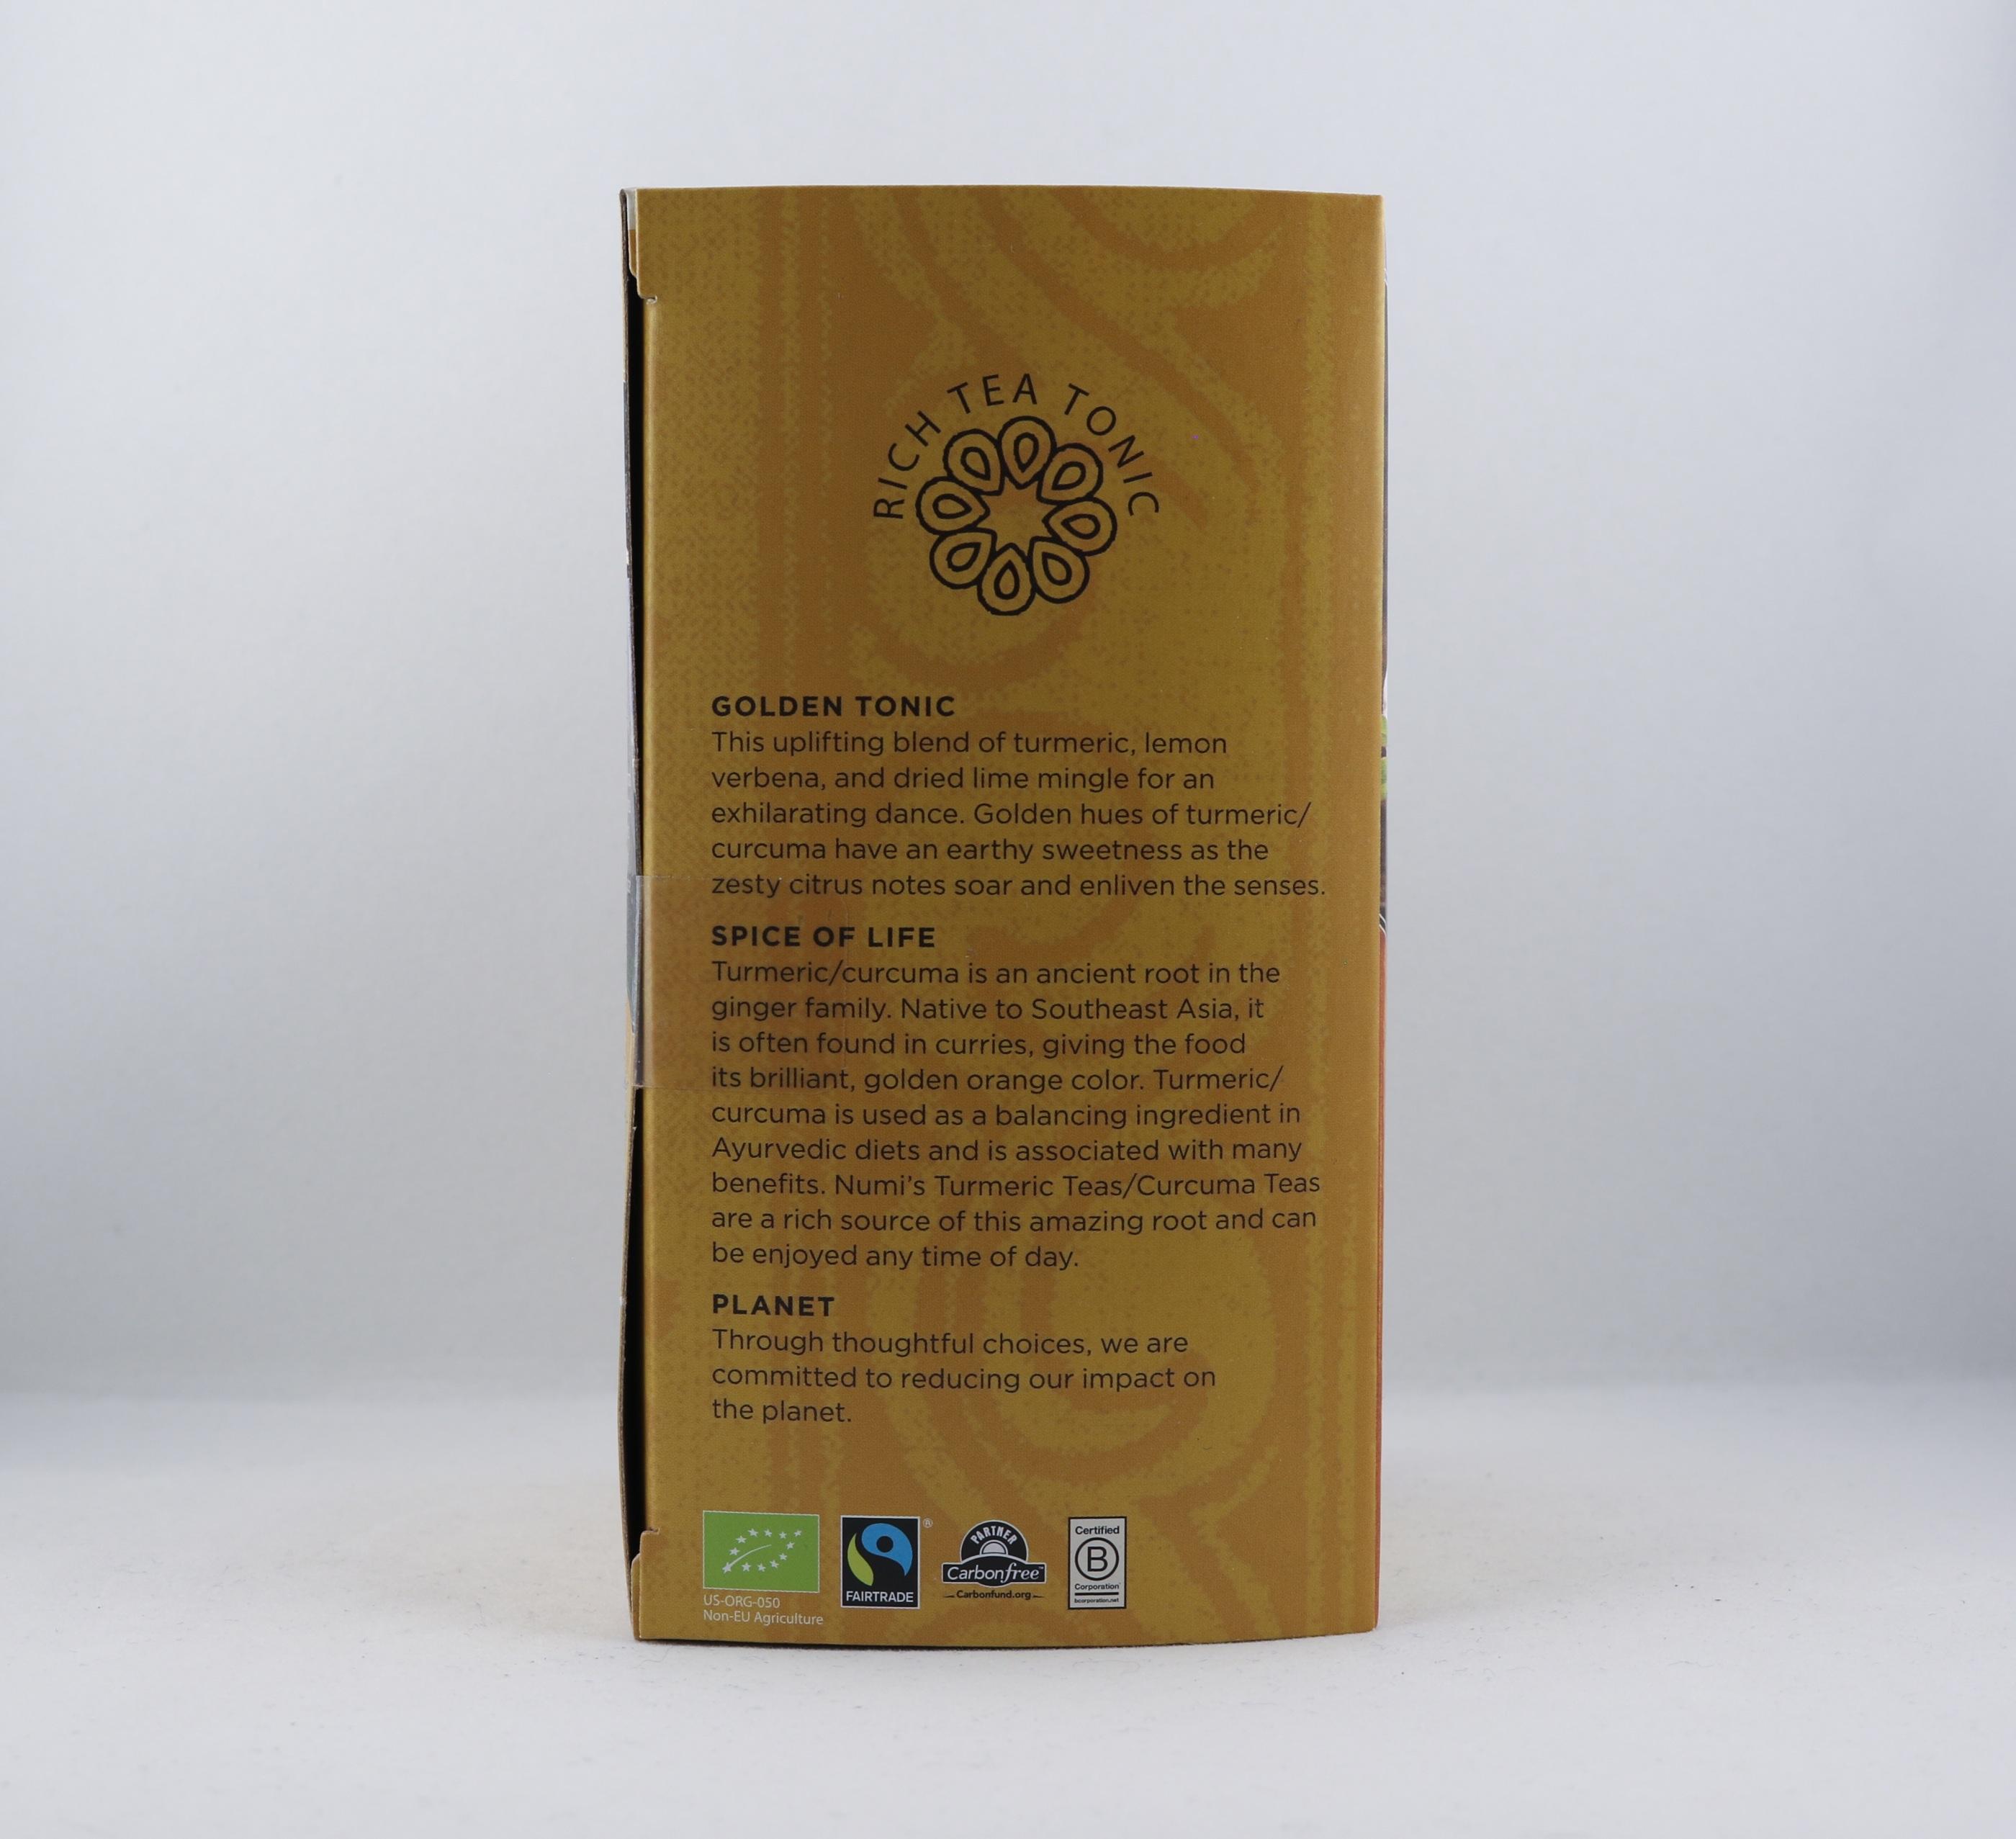 Turmeric Curcuma Golden Tonic te Wellness Ayurveda Halmstadmassören Halmstad Sverige Sweden svensk eko ekologiskt fair labor fairtrade